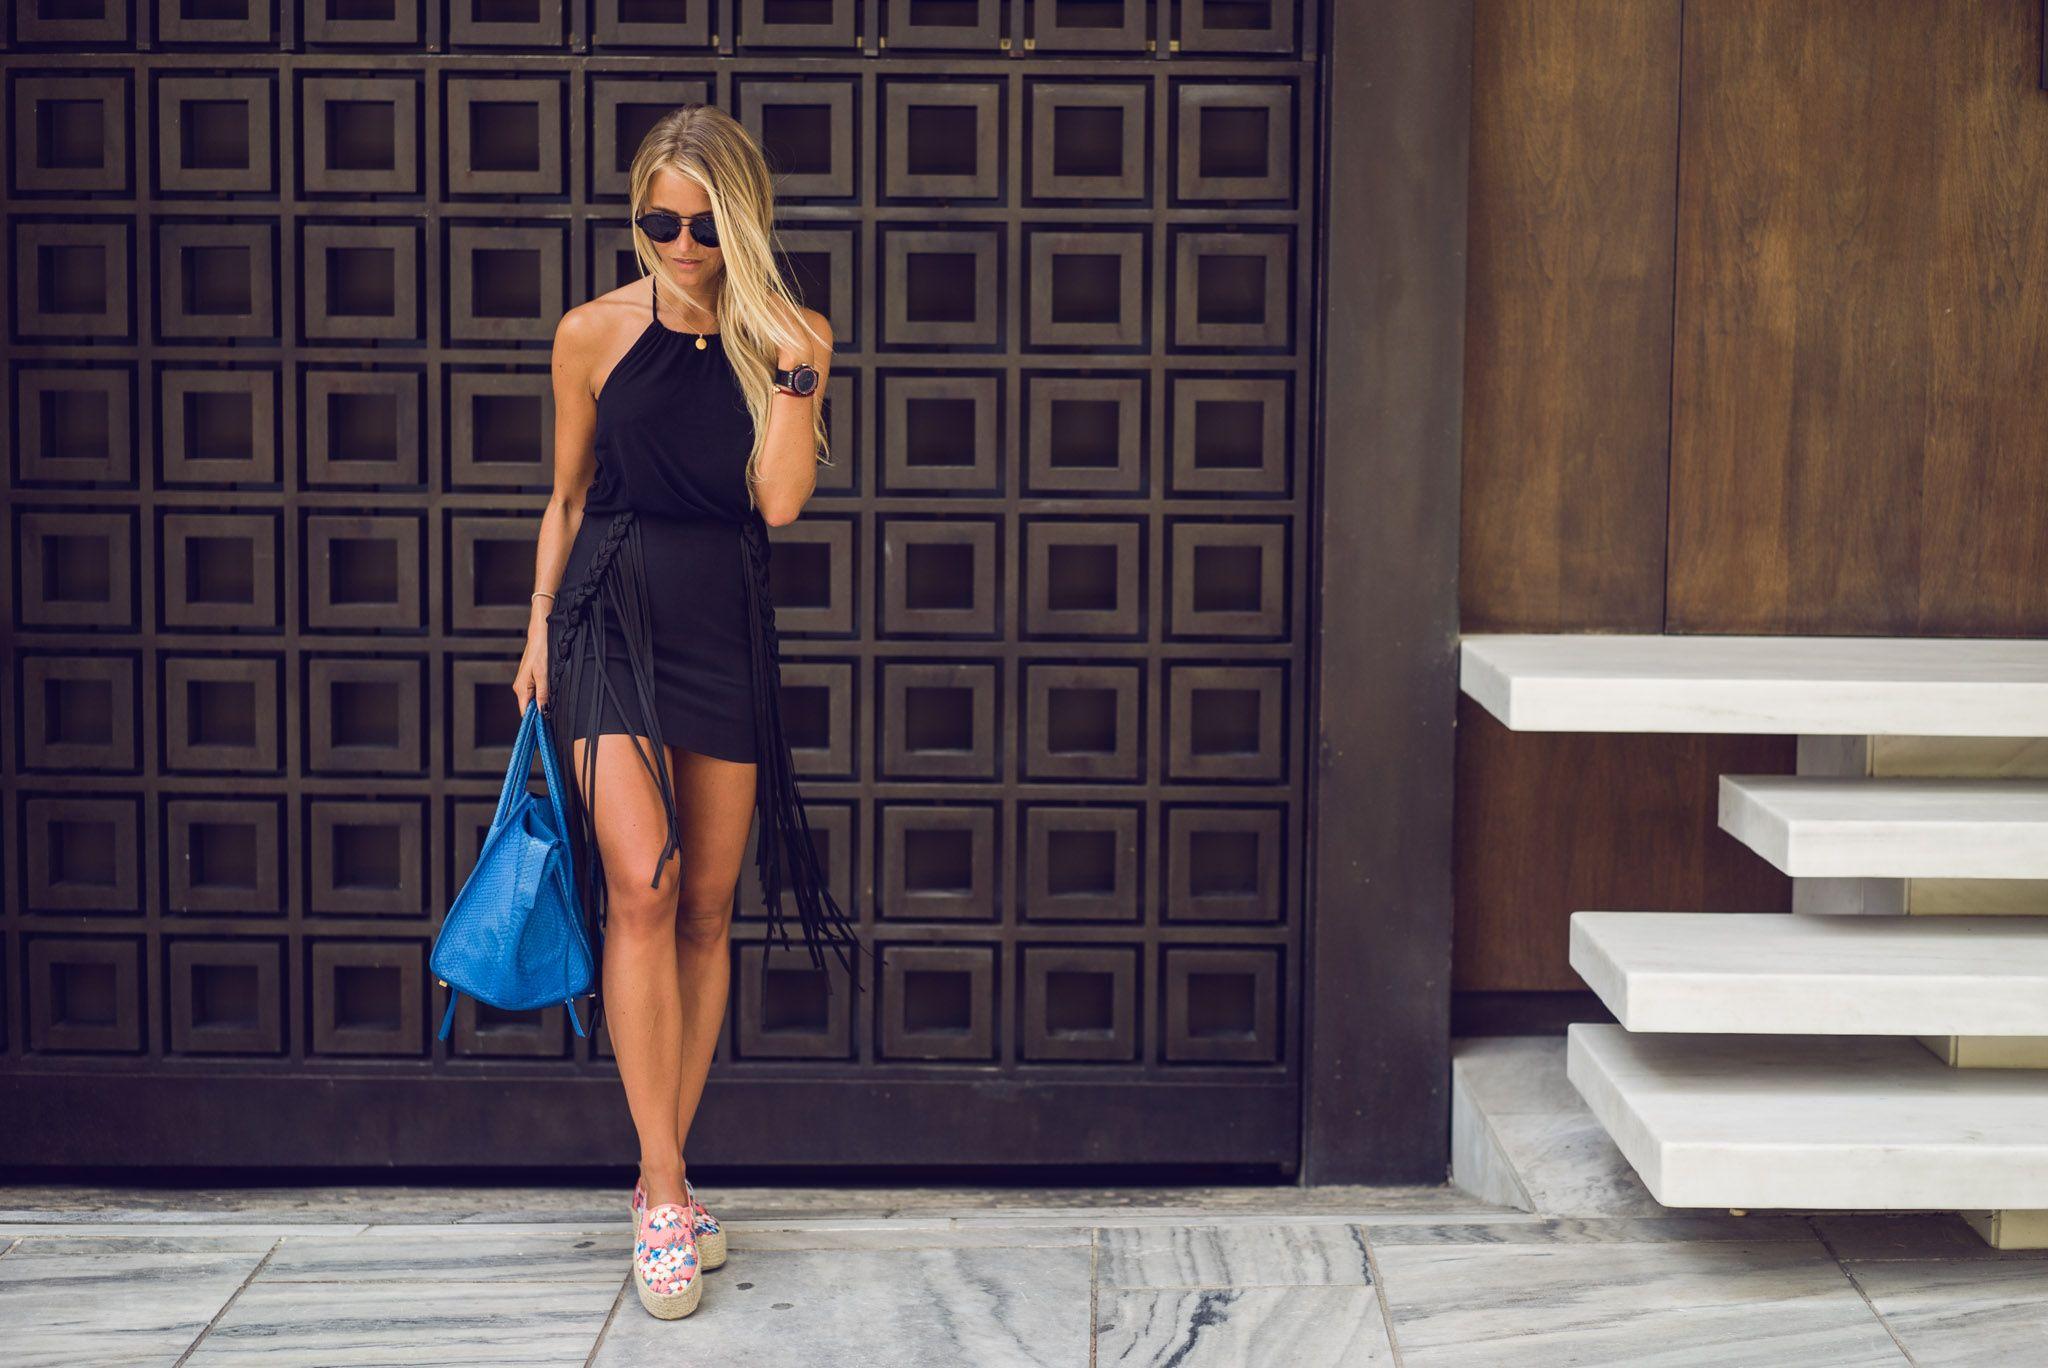 Janni-deler-outfit-2.jpg 2.048 ×1.368 pixels